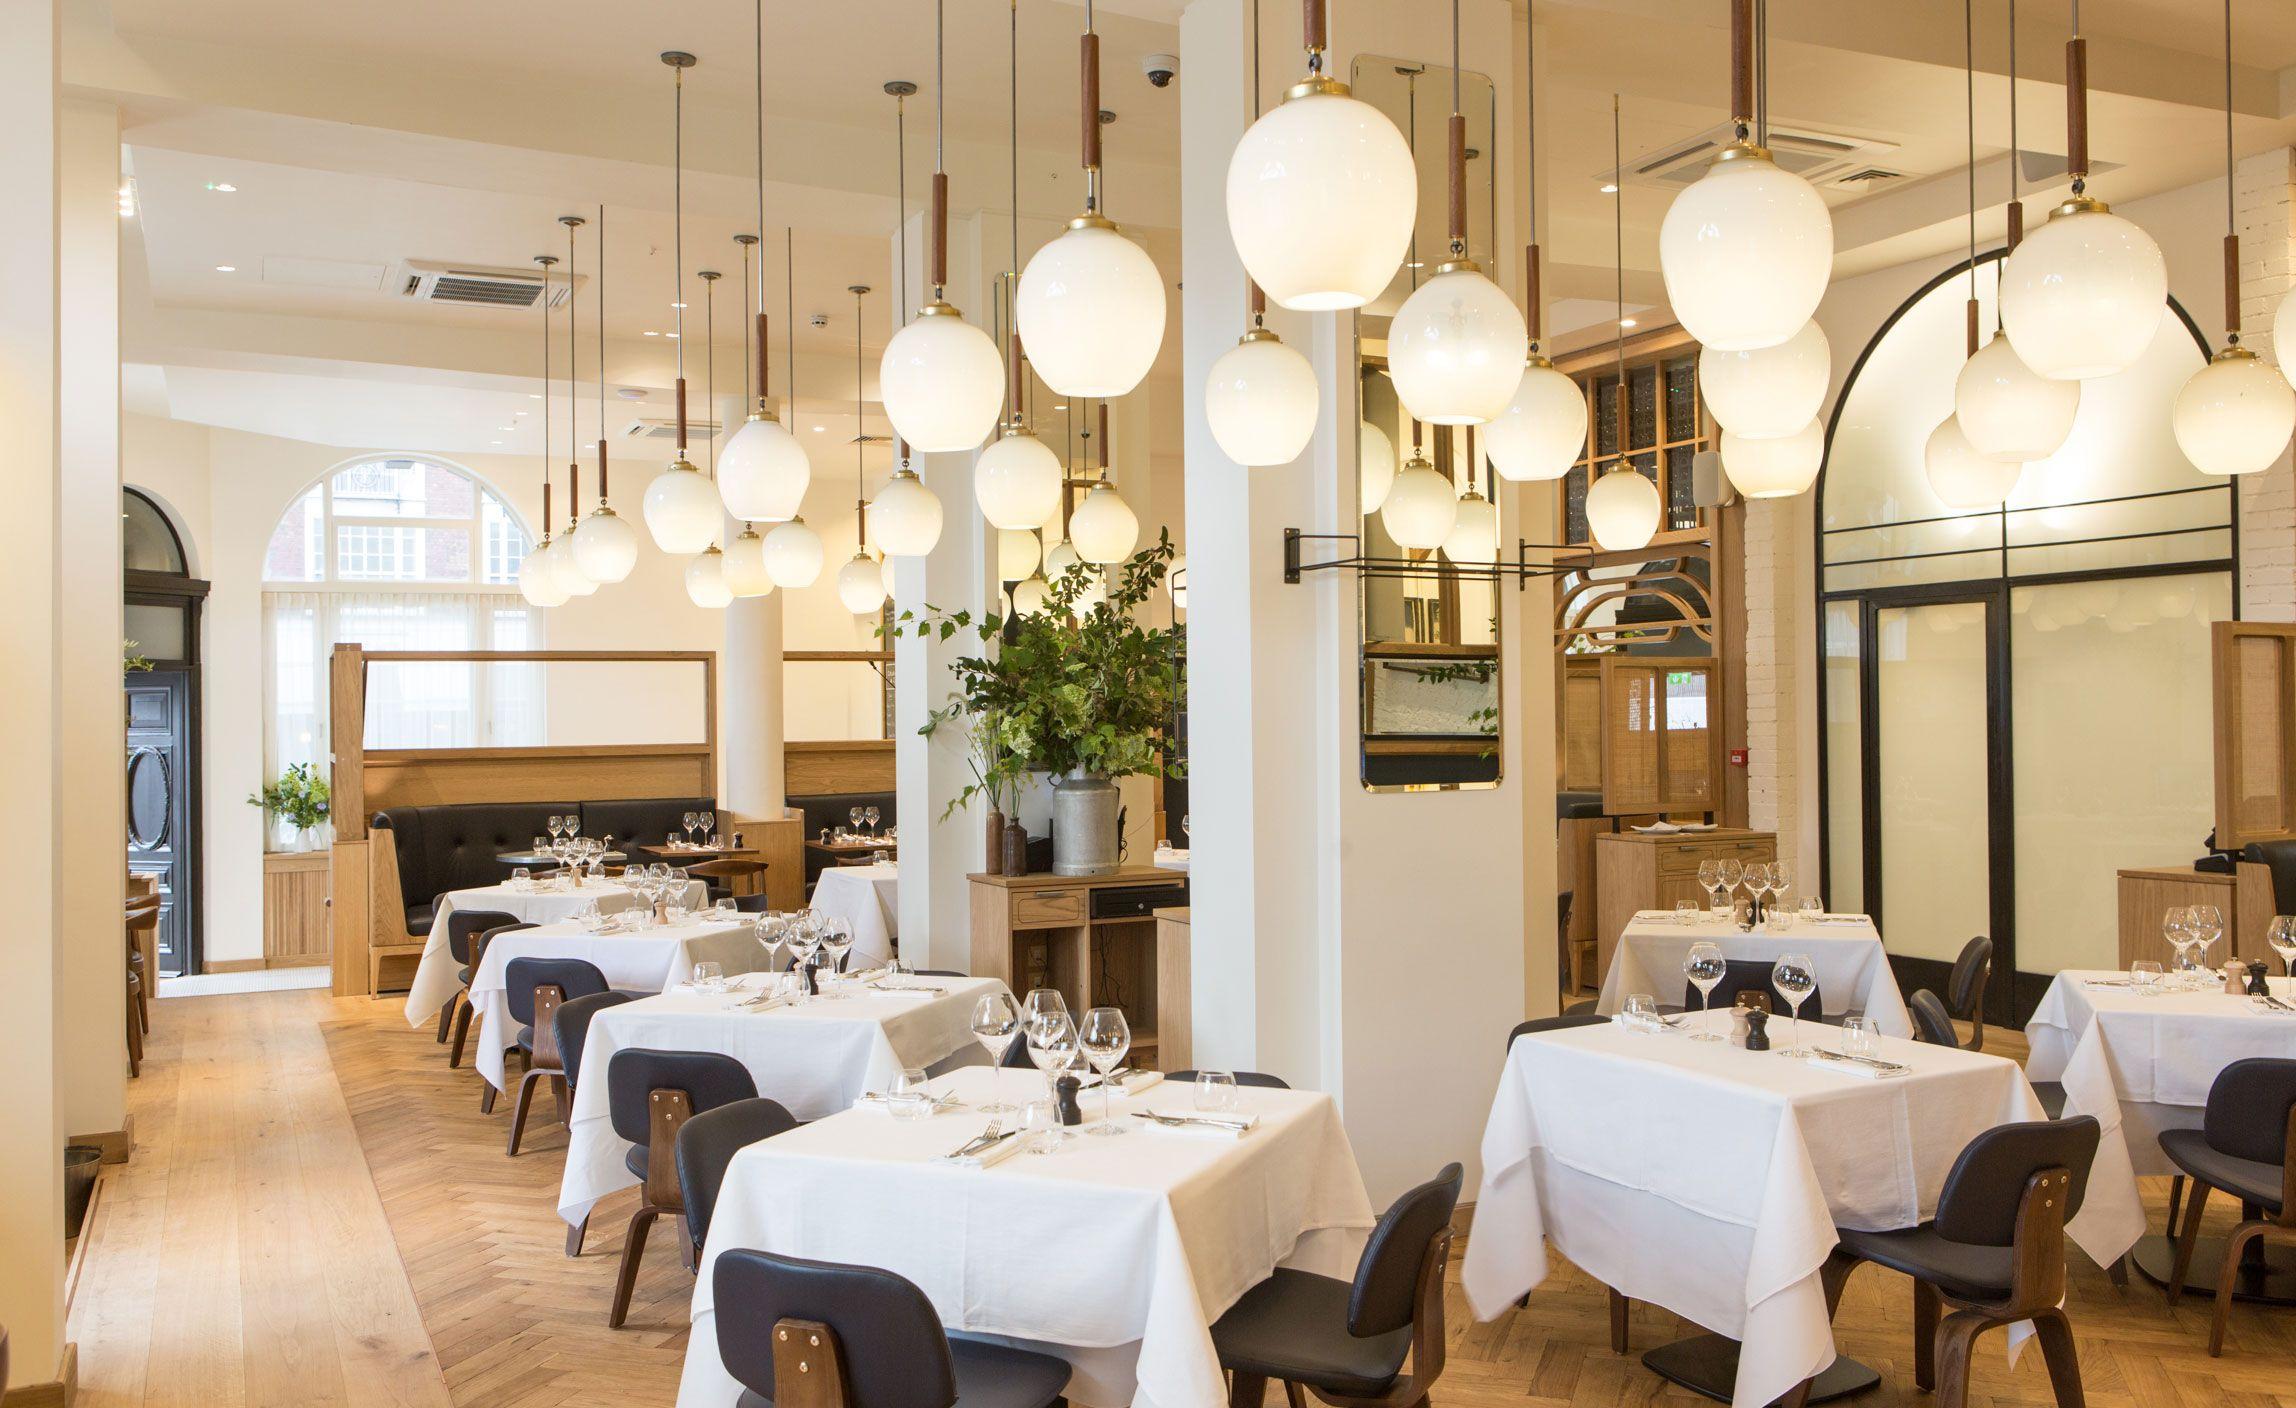 Indian restaurants interior design the modern pantry finsbury square london uk  travel wallpaper